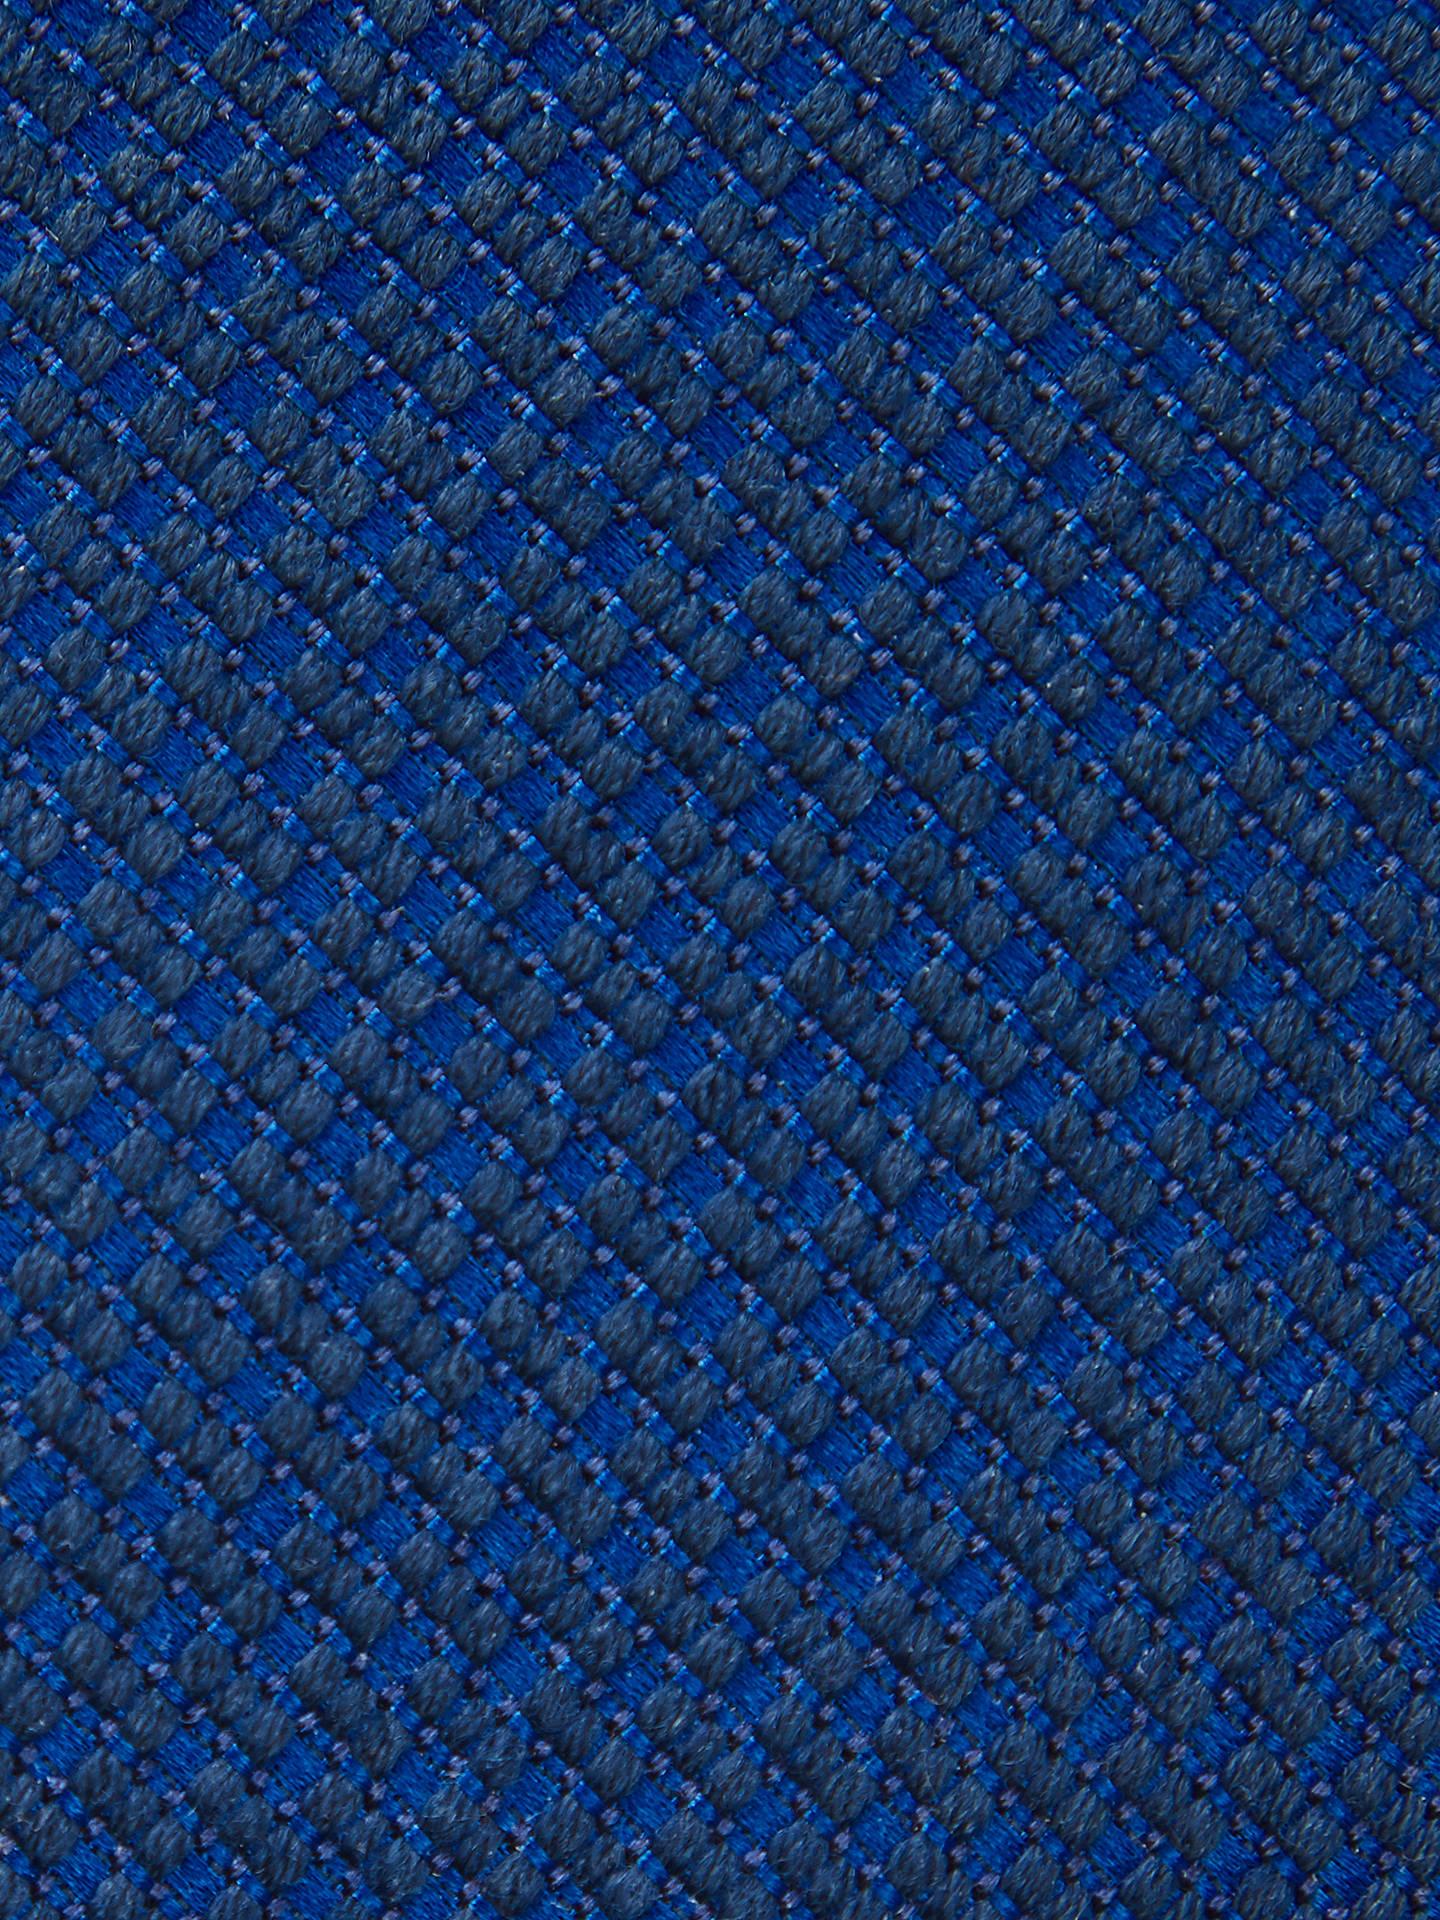 5098b1e6ac Buy HUGO by Hugo Boss Micro Jacquard Wool Silk Tie, Navy Online at  johnlewis.